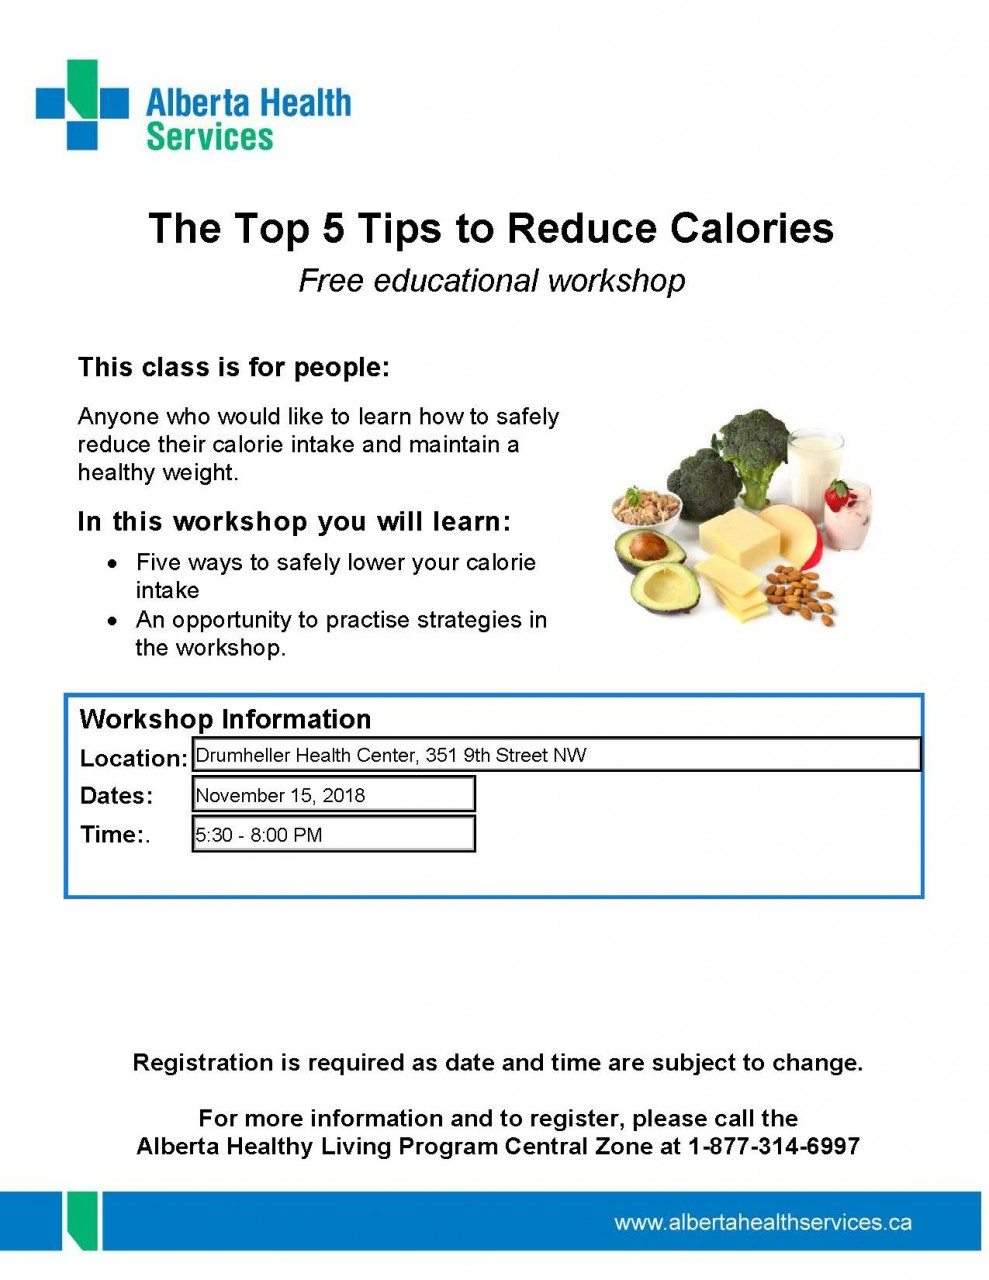 Drumheller----Nutrition-Top-Five-Tips-Nov-15-2018